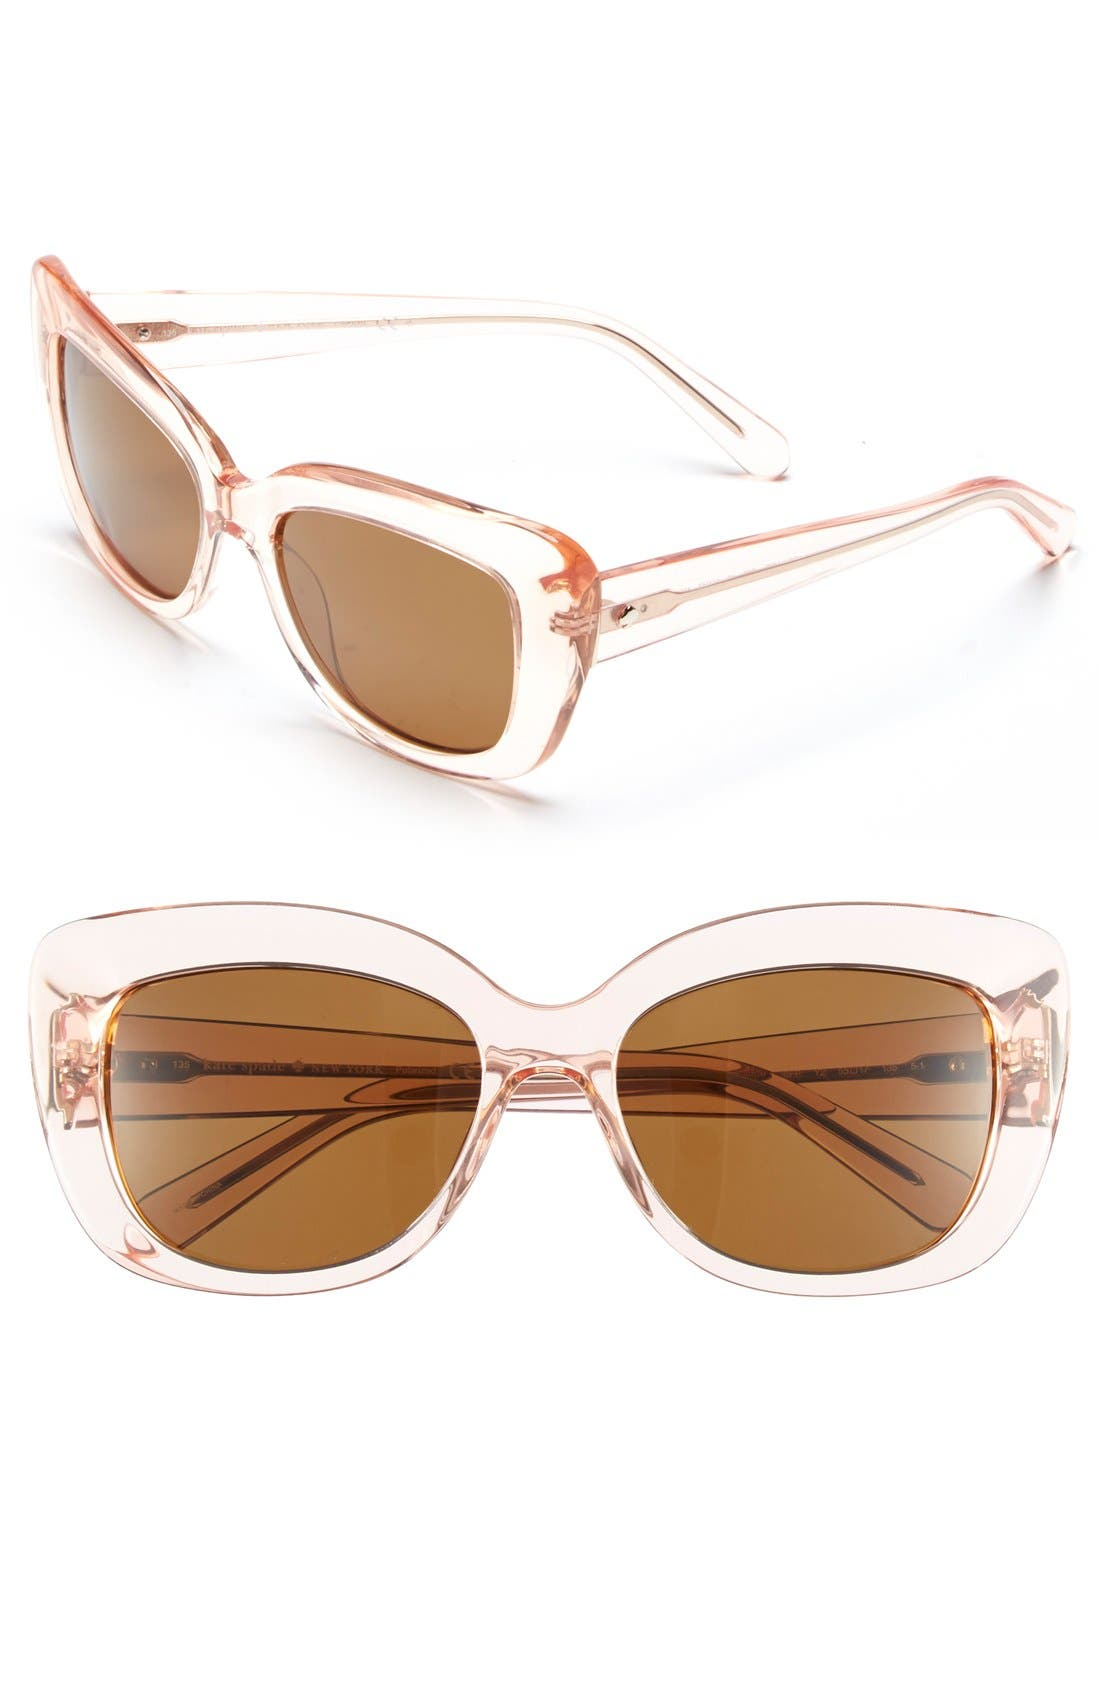 Main Image - kate spade new york 'ursula' 55mm polarized cat eye sunglasses (Nordstrom Exclusive)